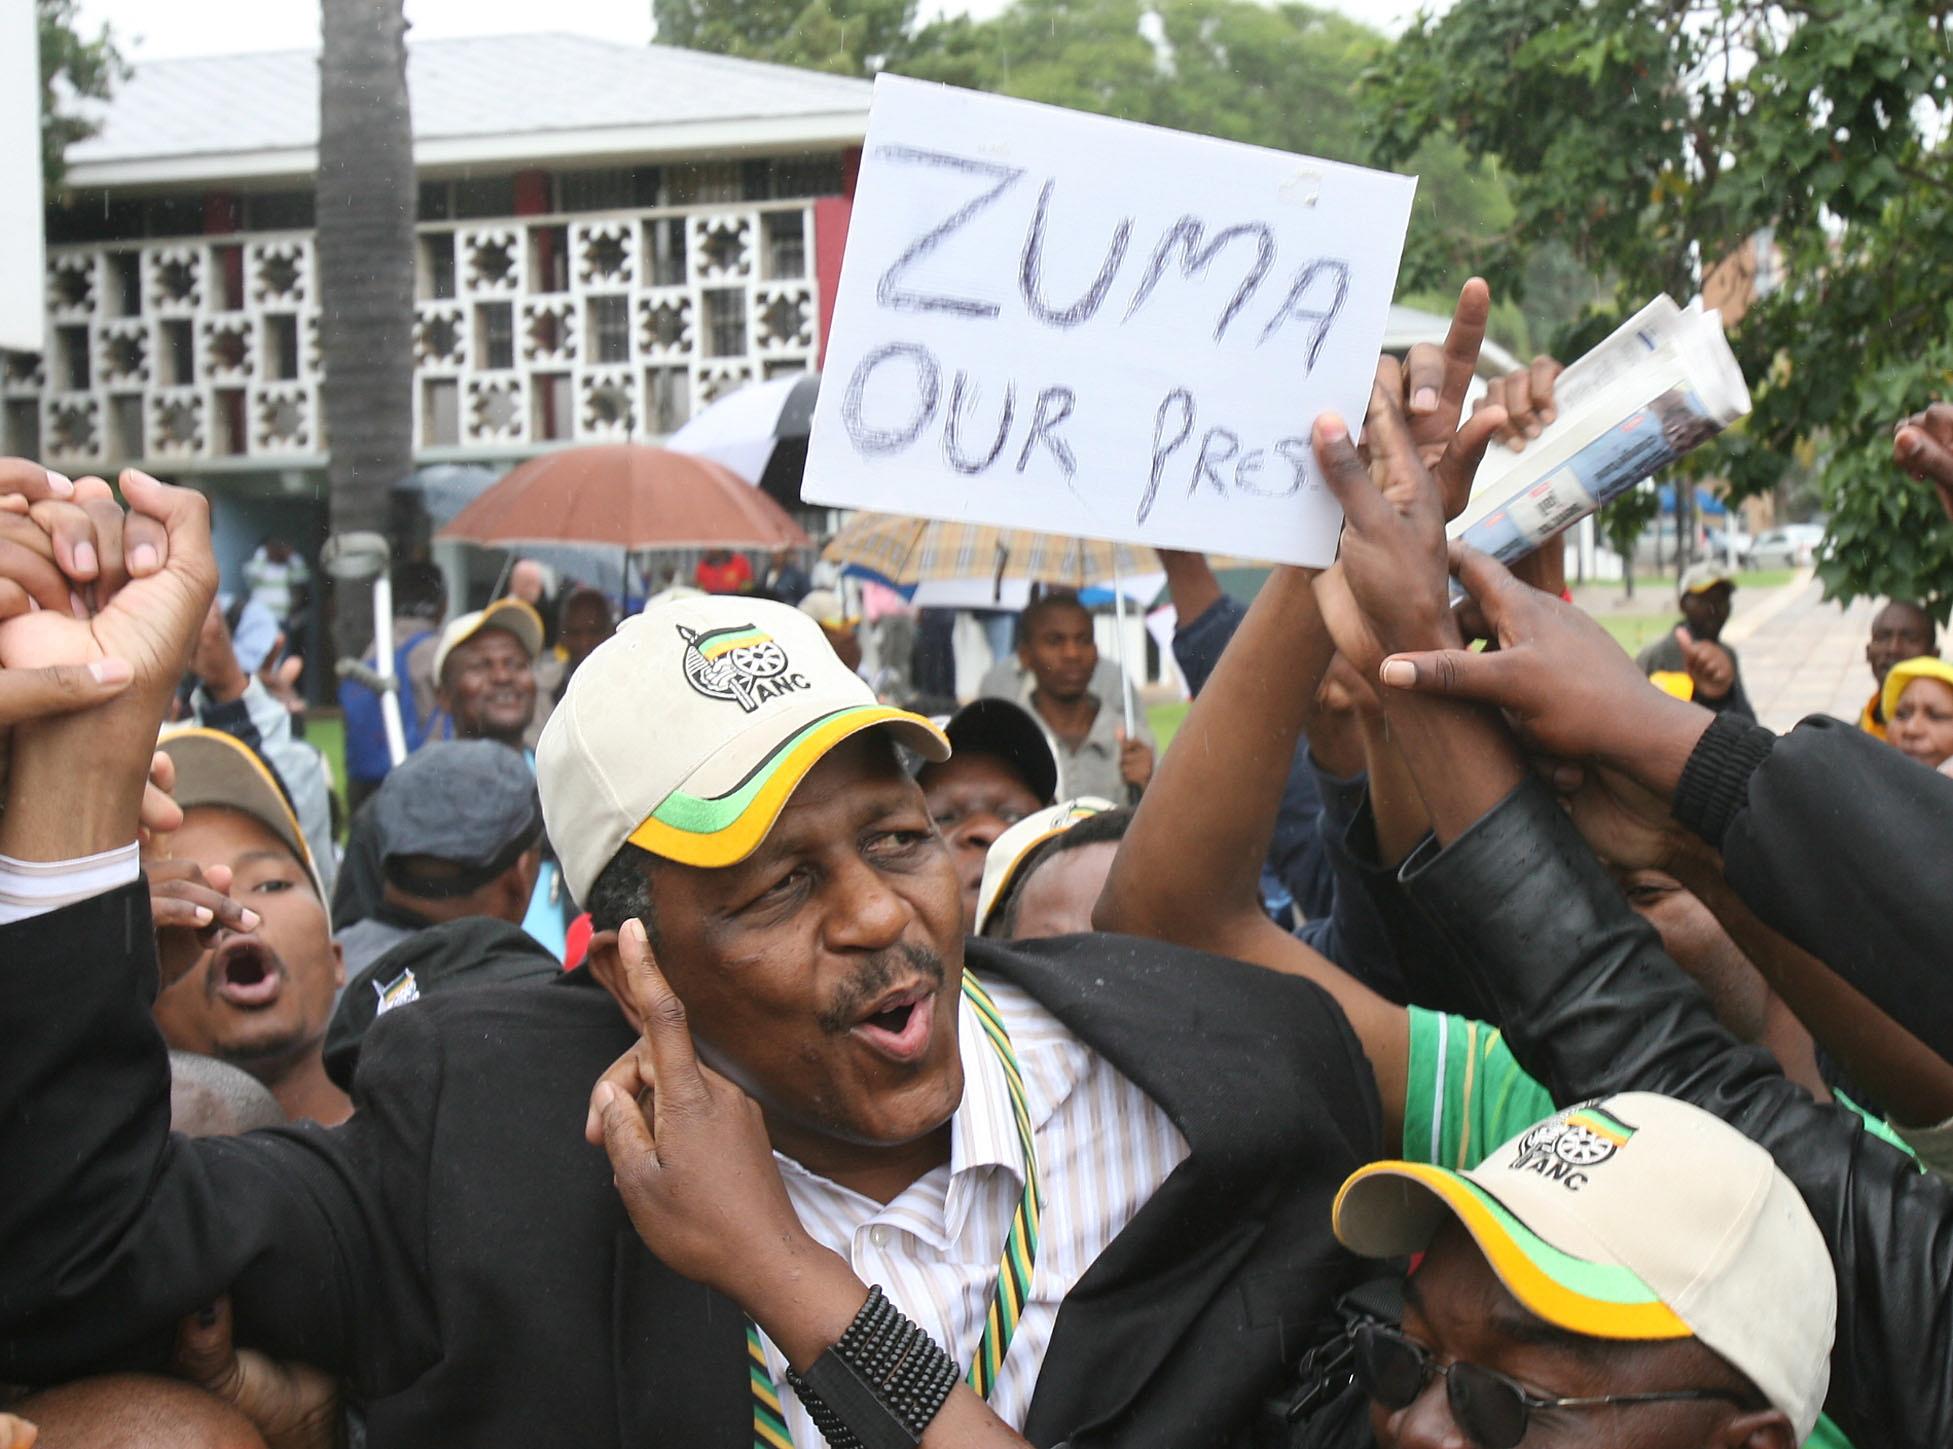 Mathews Phosa, elected alongside Jacob Zuma in 2007, singing and dancing with Zuma supporters at Polokwane....